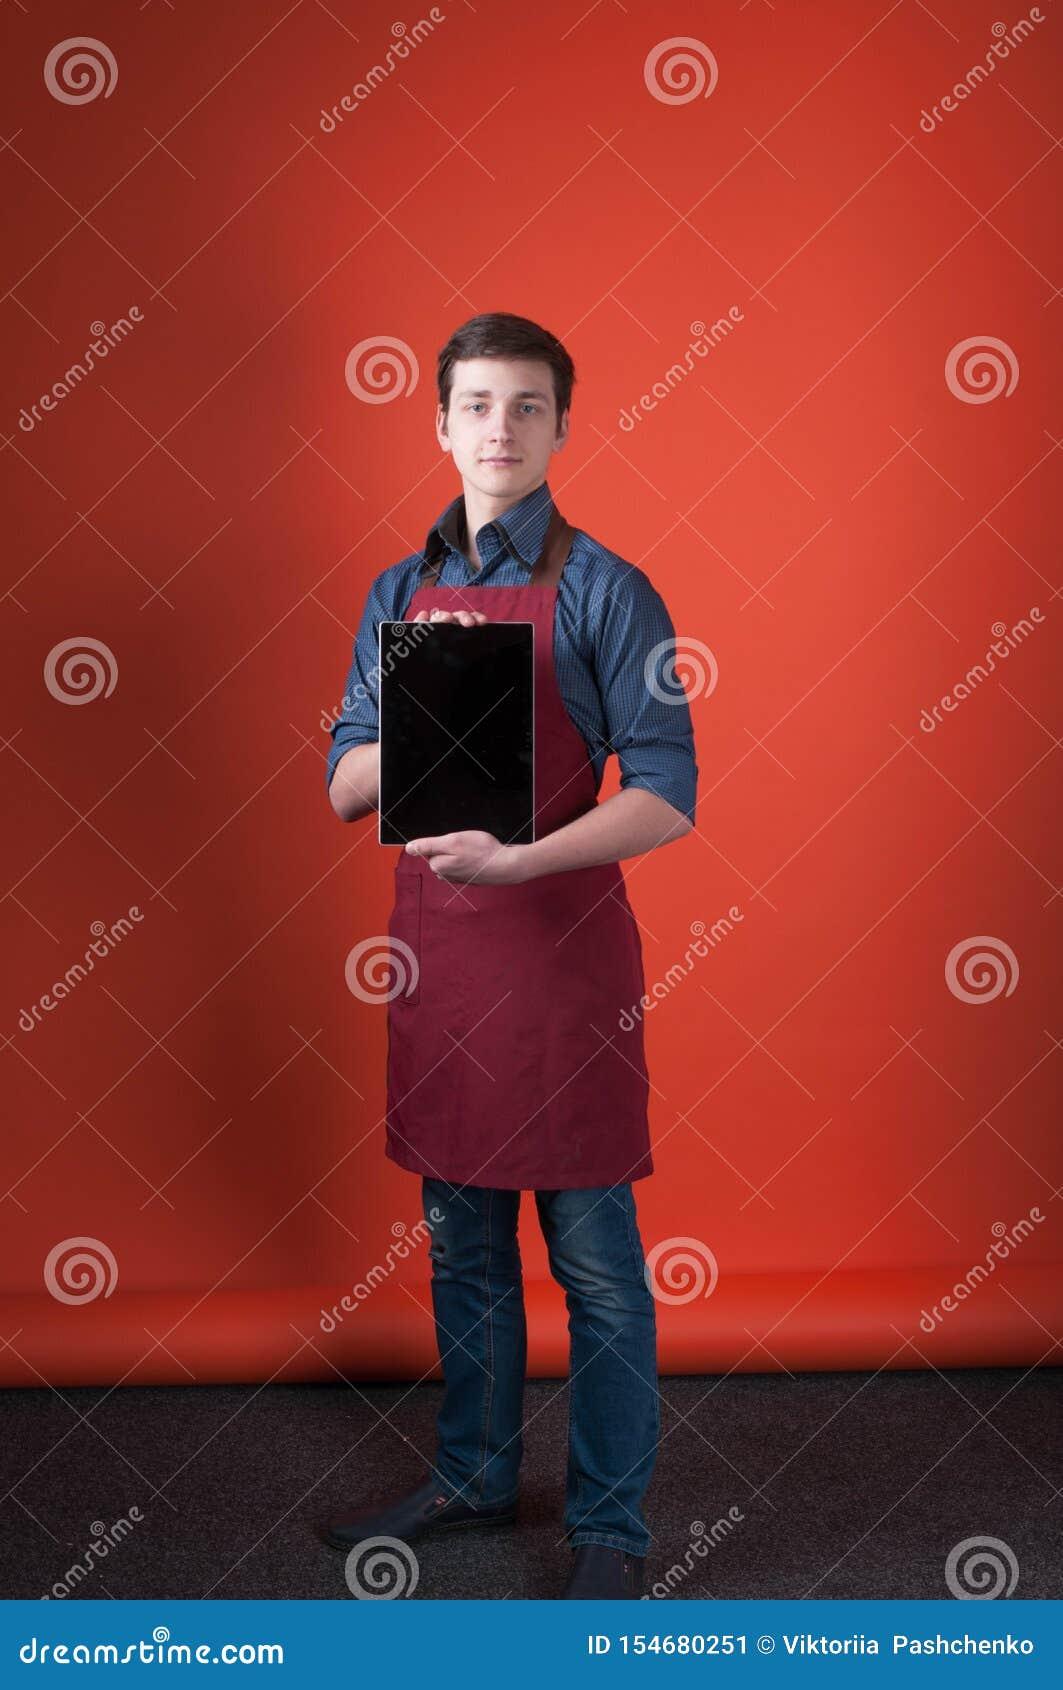 Barista με τη σκοτεινή τρίχα στο μπλε πουκάμισο, τα τζιν και burgundy την ποδιά που κρατά την ψηφιακή ταμπλέτα